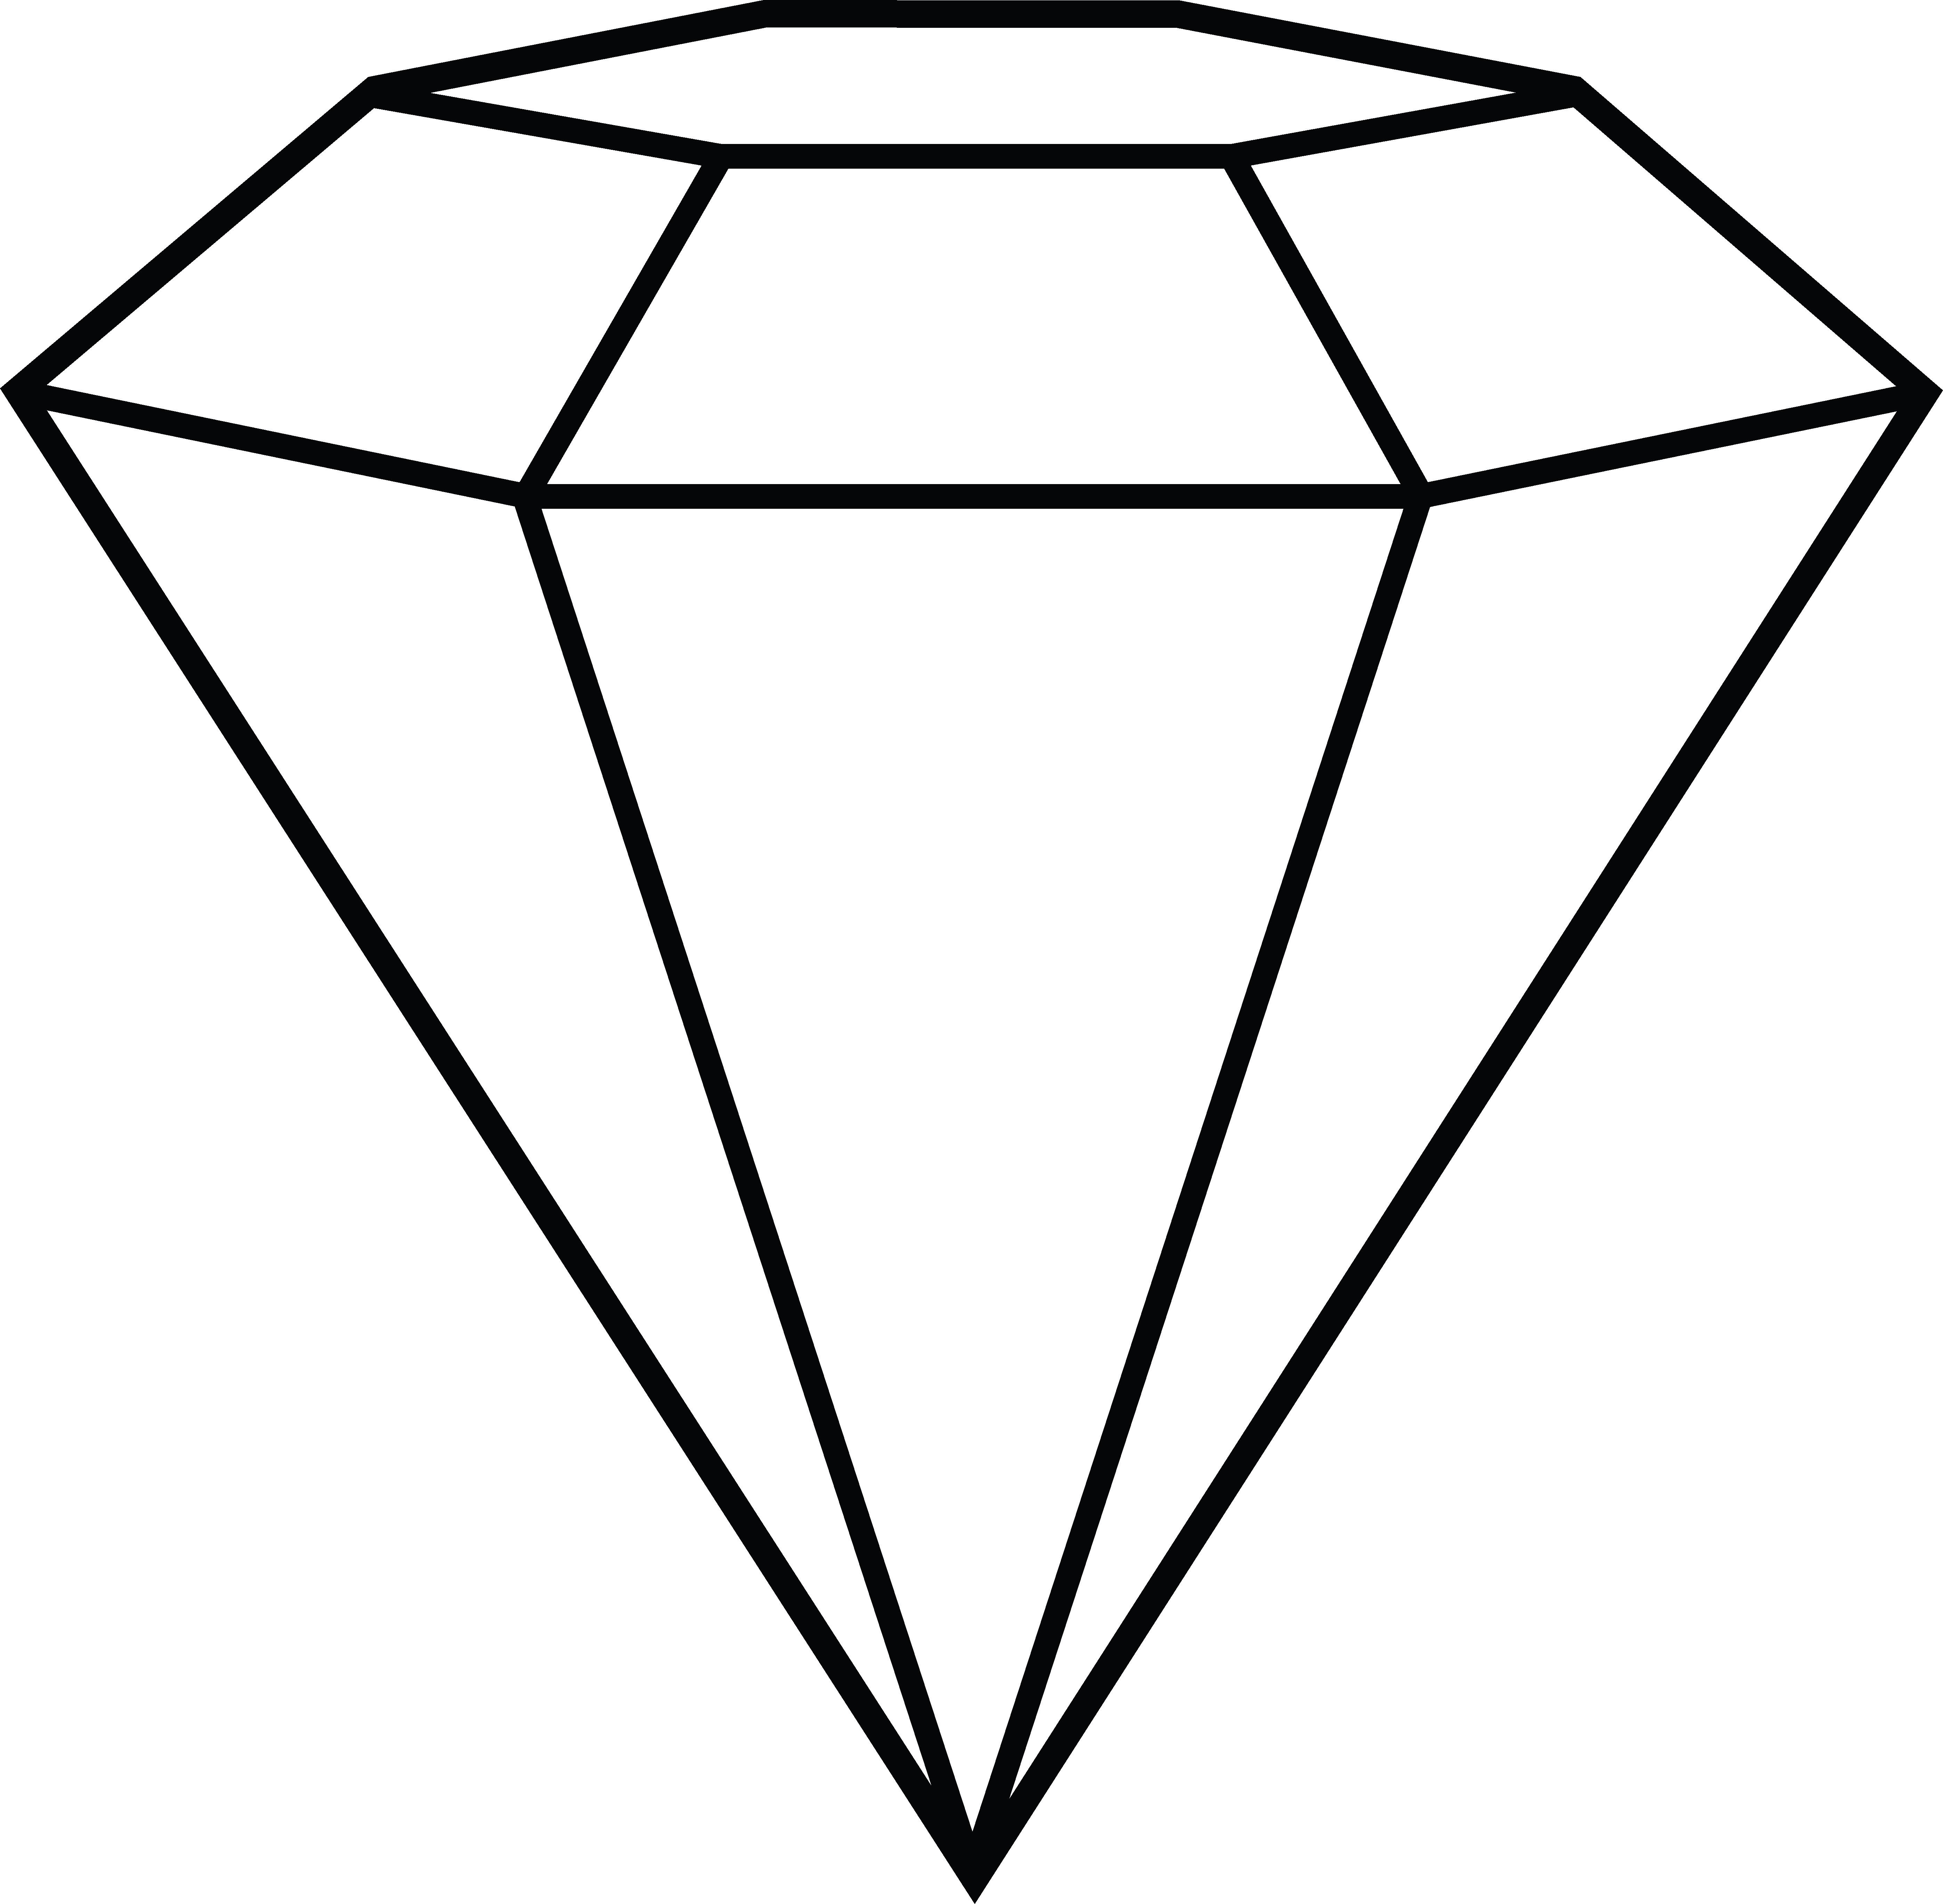 Diamond Drawing 3d | Free download best Diamond Drawing 3d